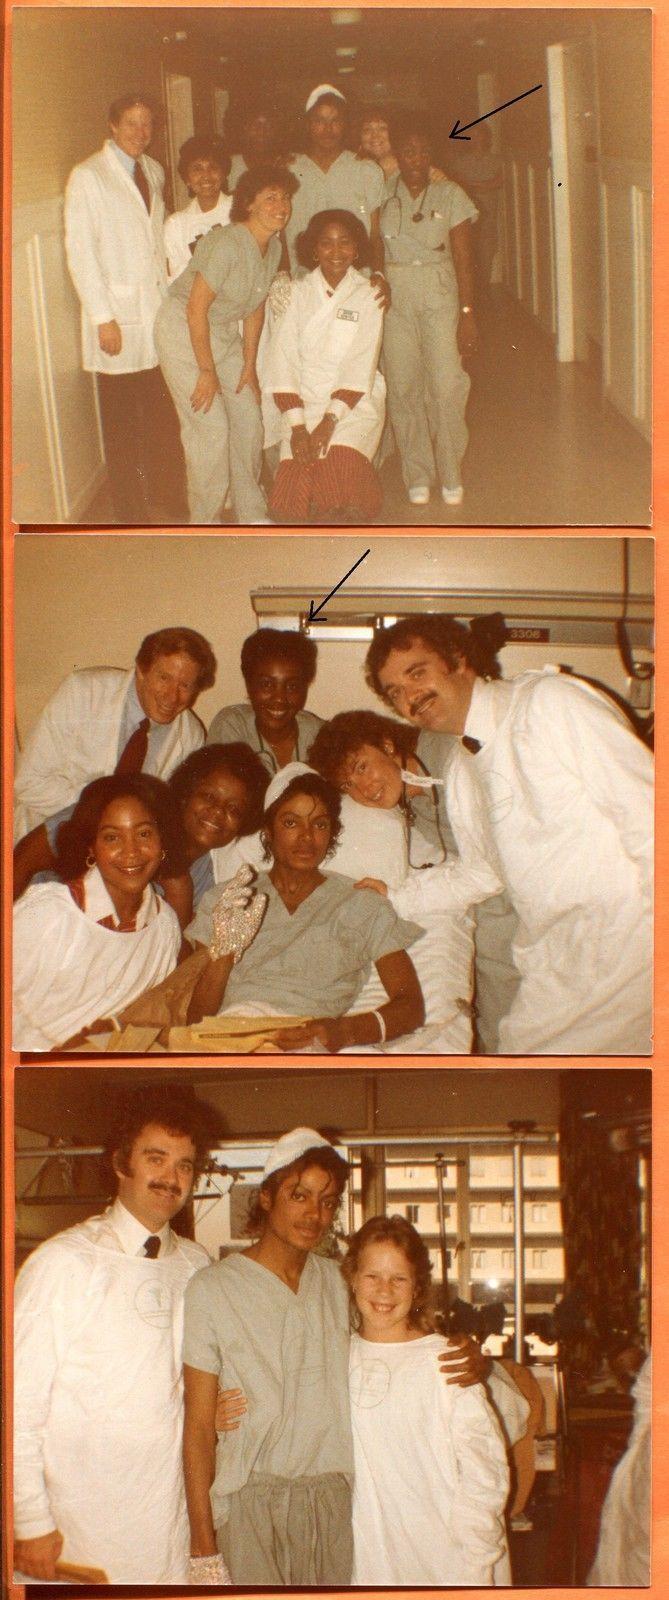 1984 Pepsi Hospital Michael Jackson Used Pillow Case PSA DNA Autograph ID Hair | eBay